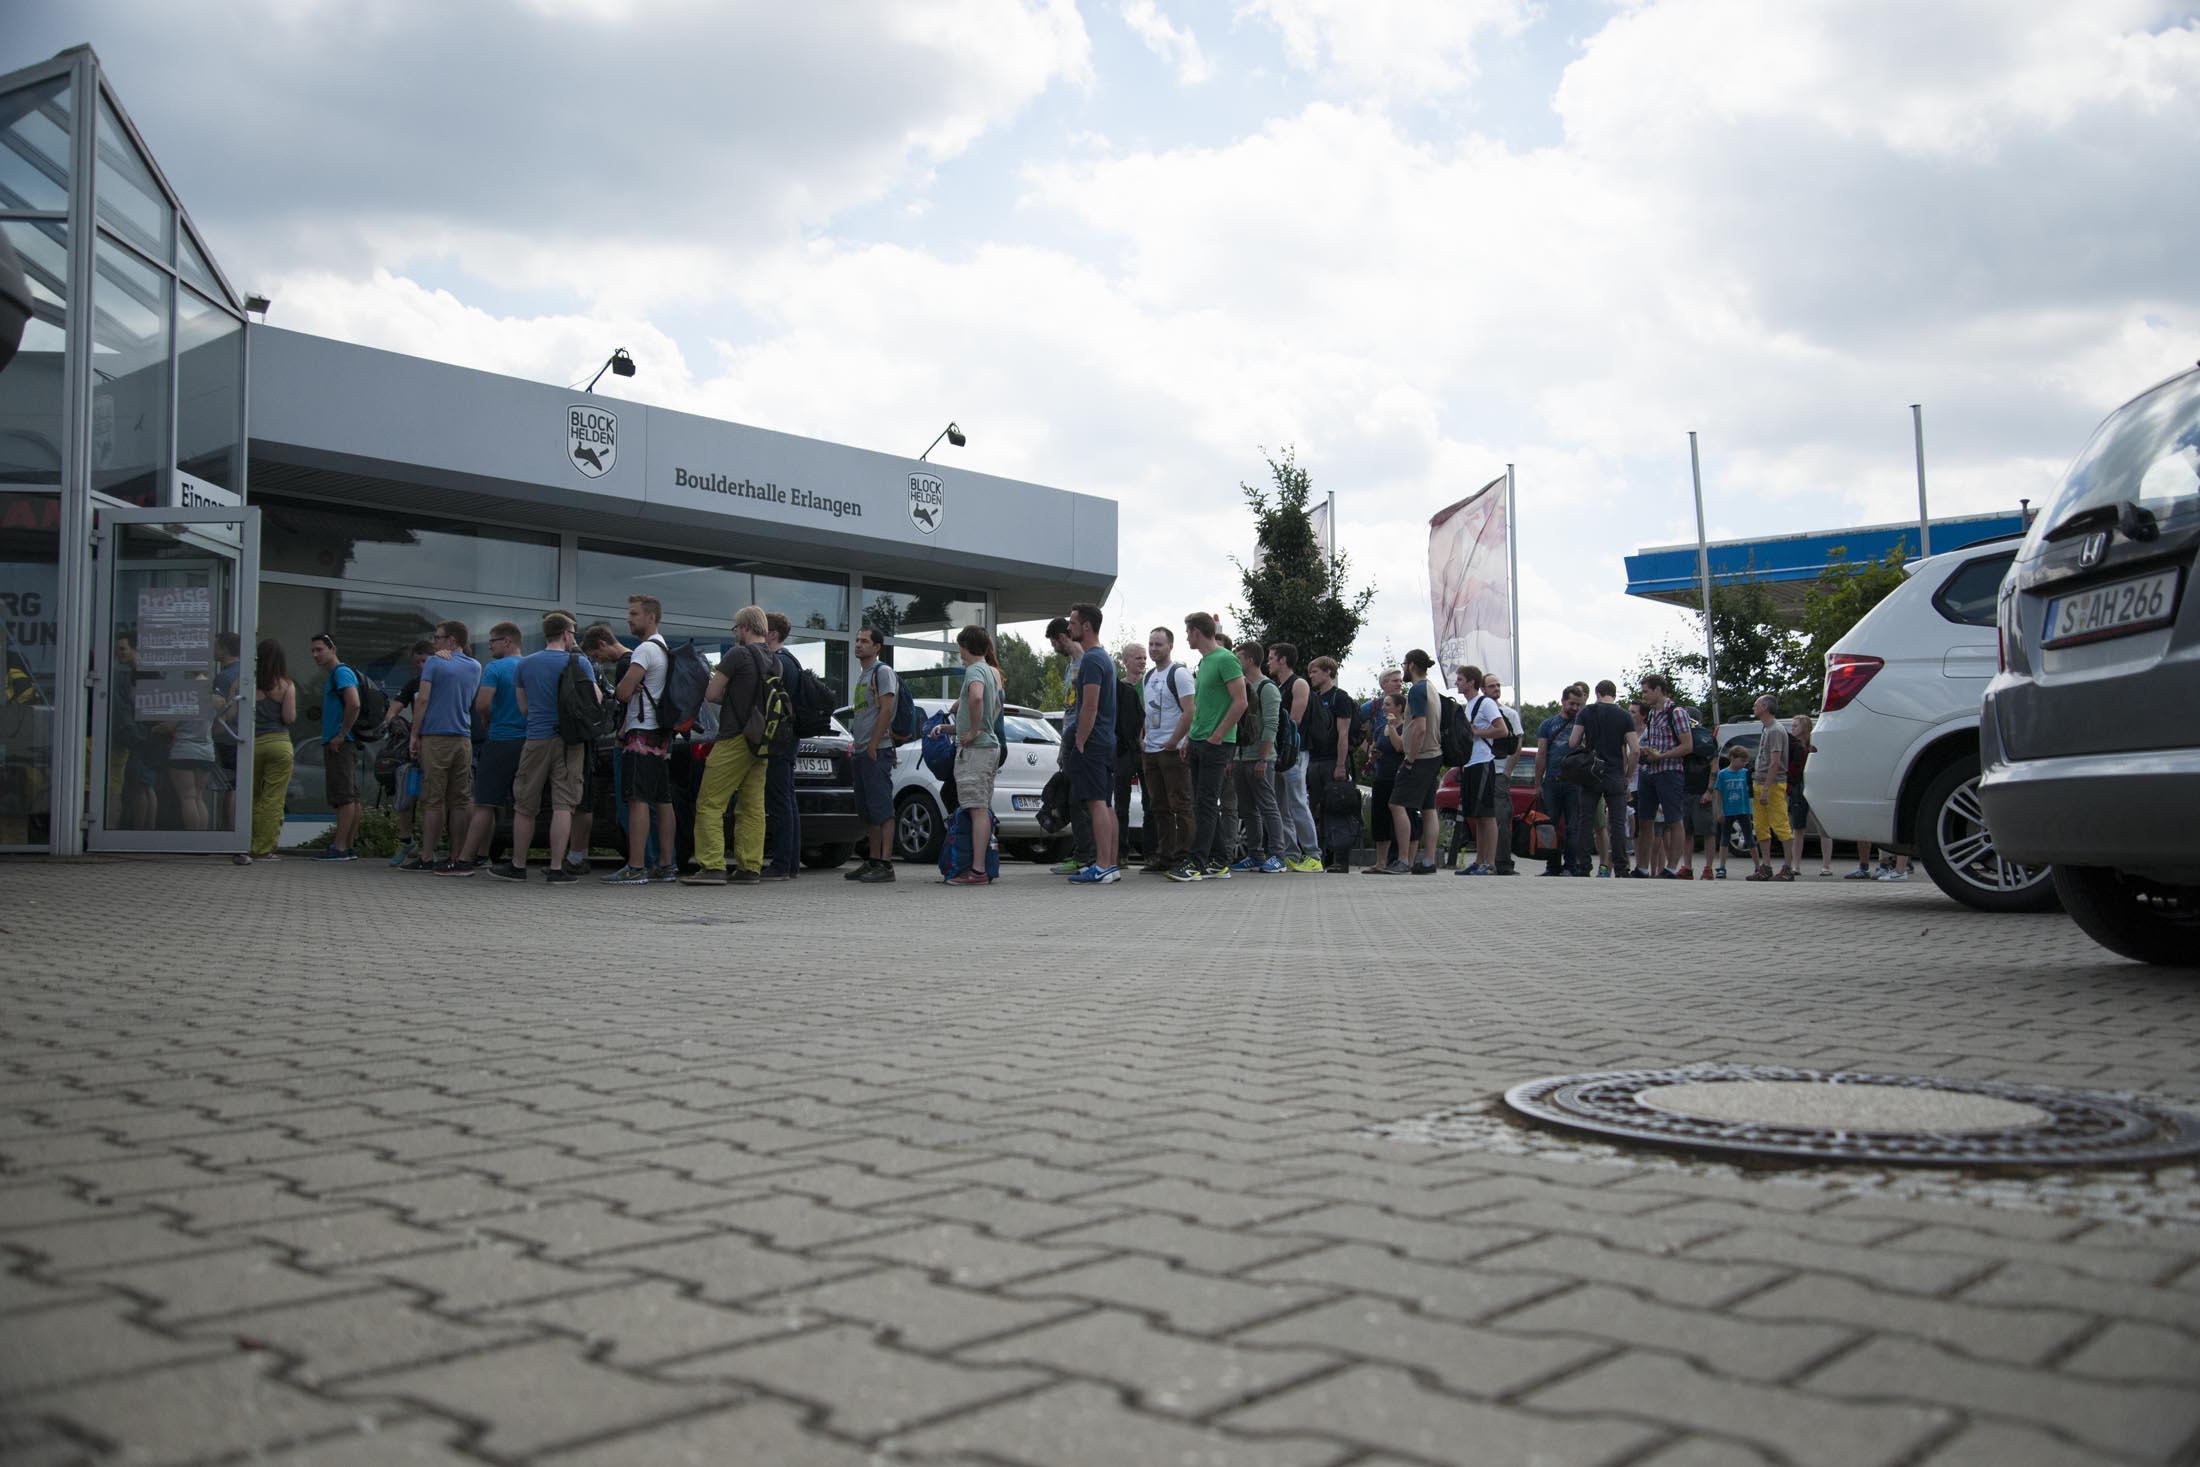 Registration internationaler bouldercup Frankenjura 2016, BLOCKHELDEN Erlangen, Mammut, Bergfreunde.de, Boulderwettkampf07092016080